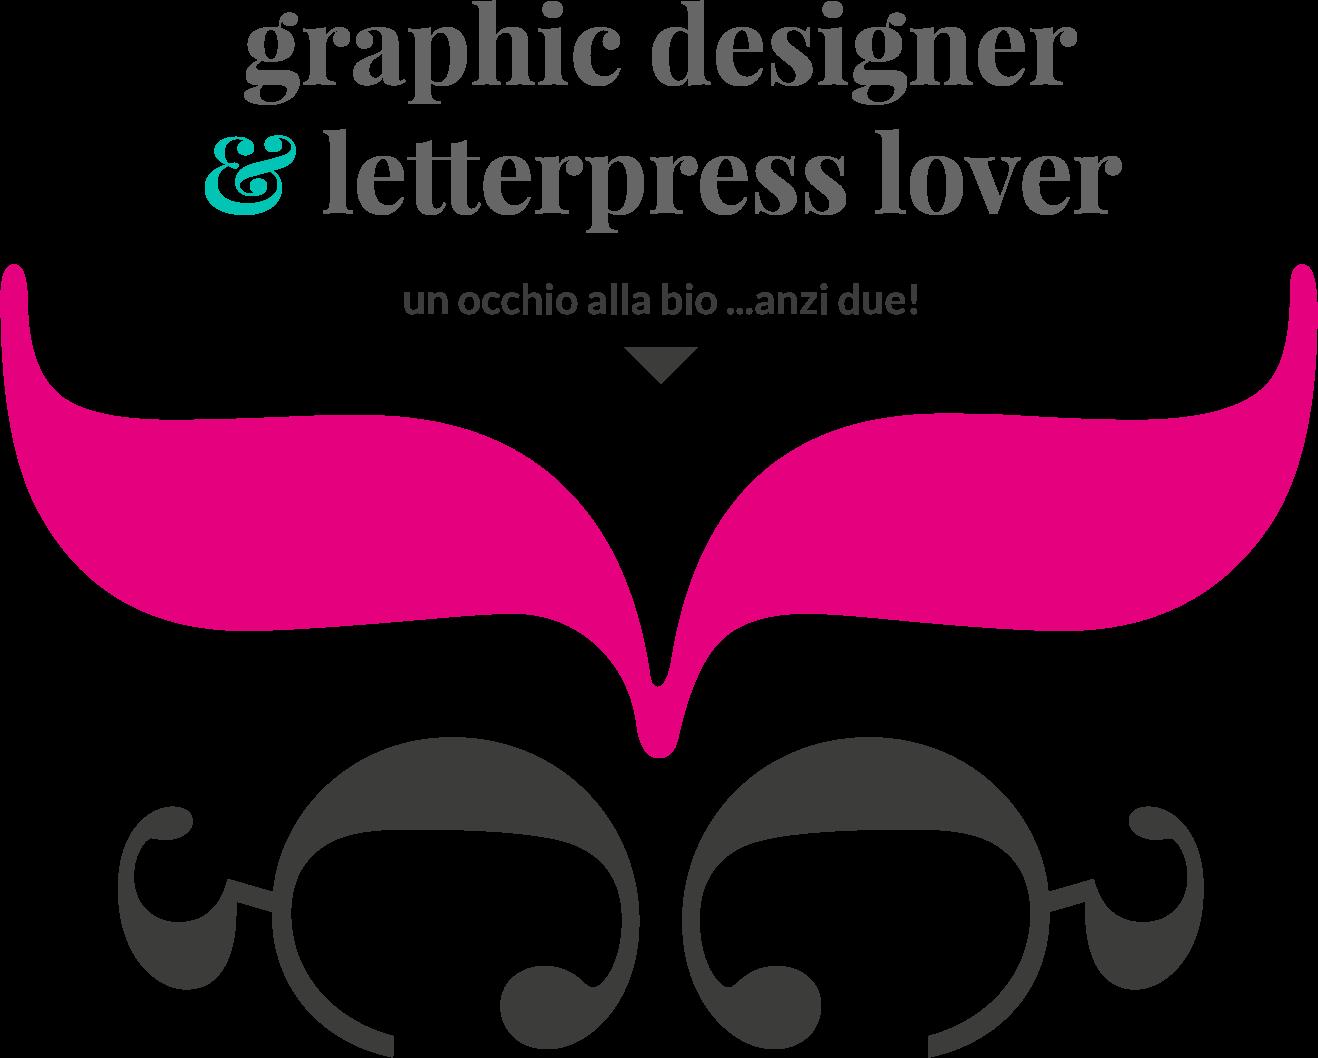 graphic designer & letterpress lover